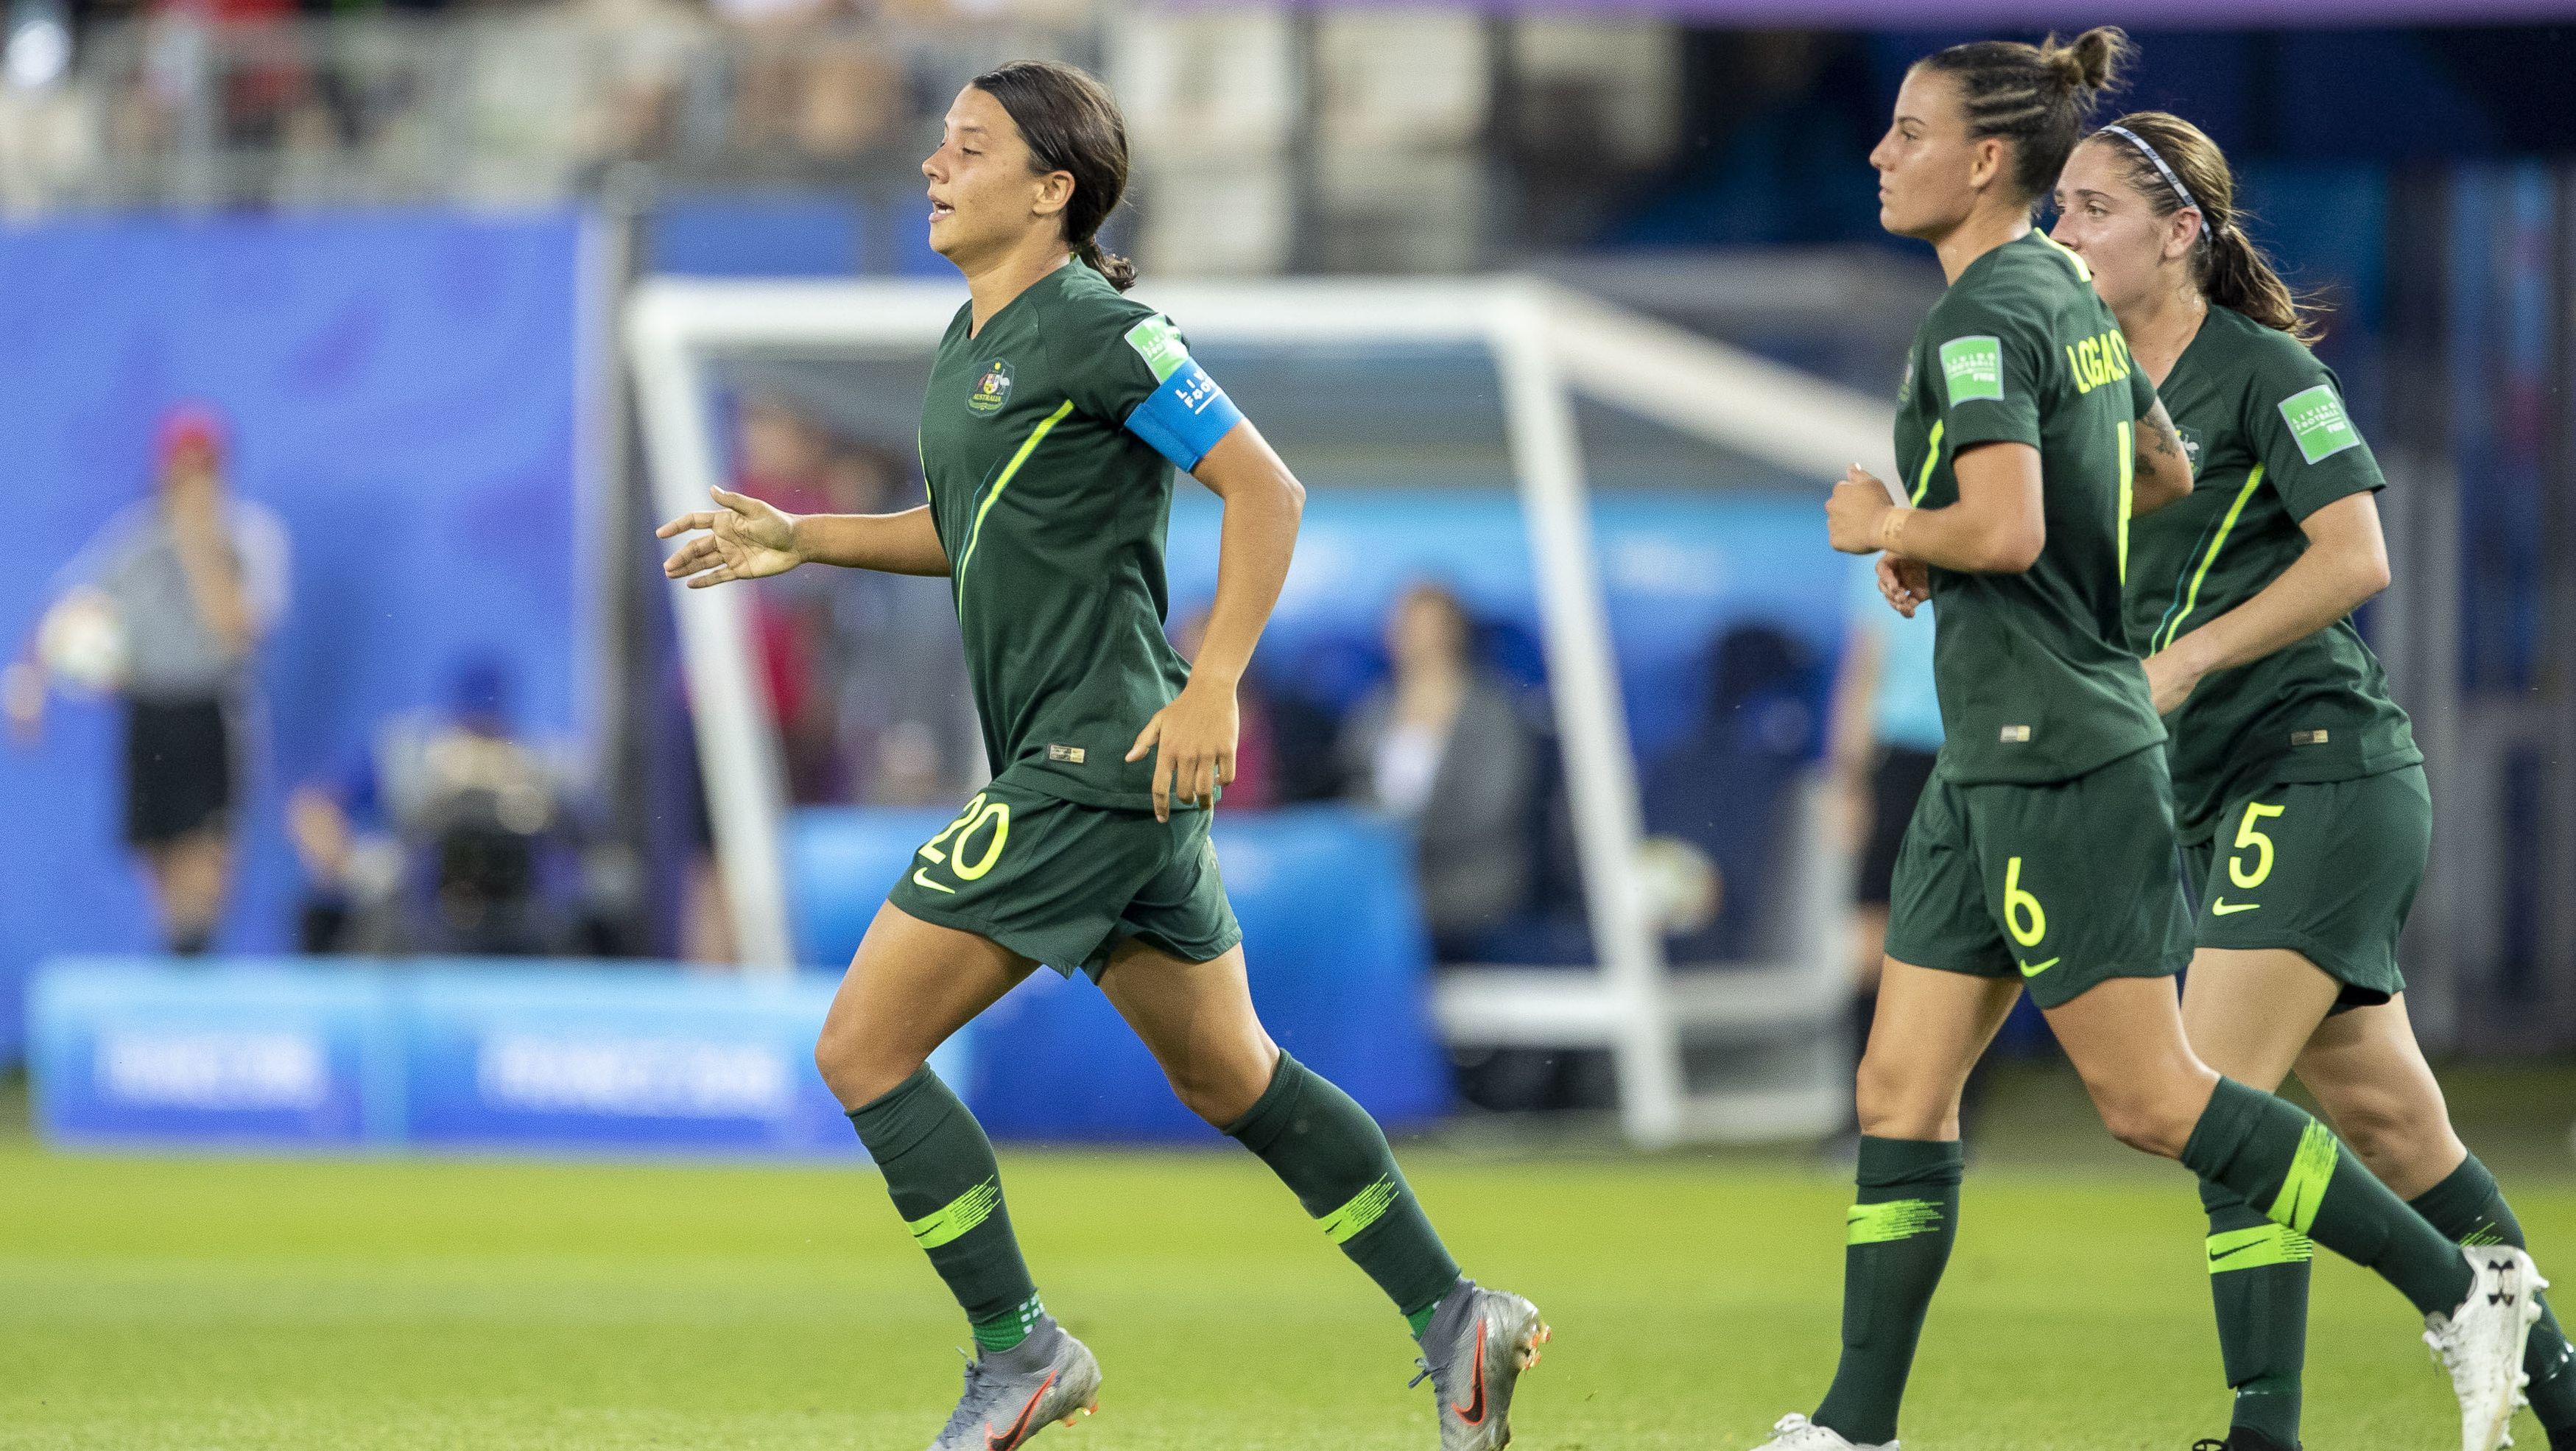 Jubel bei der Frauen-Nationalmannschaft aus Australien